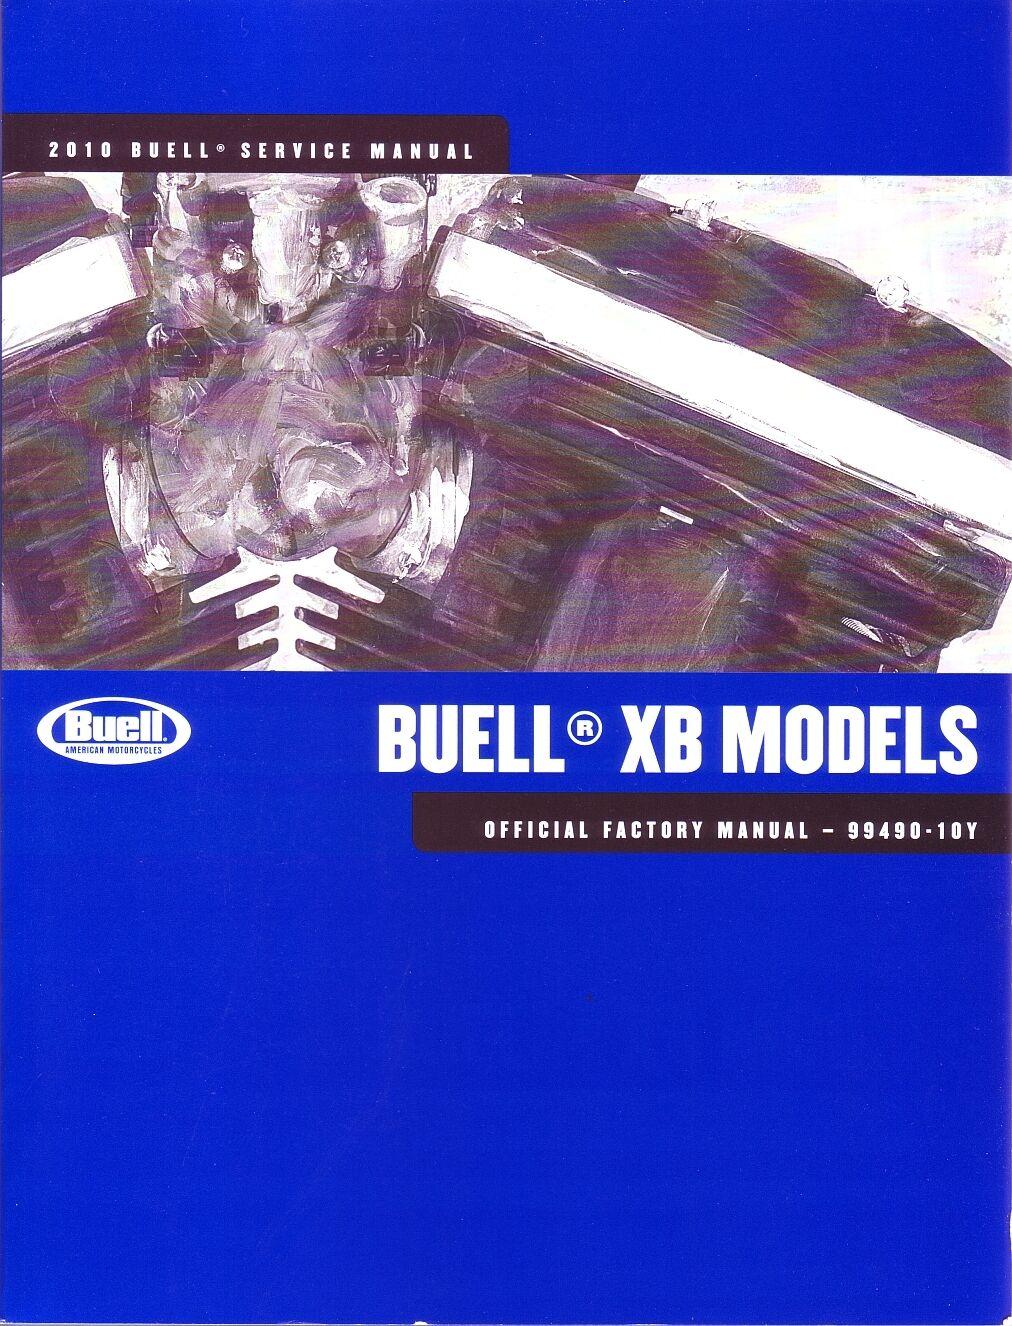 HARLEY-DAVIDSON BUELL Werkstatthandbuch 2010 XB12R Firebolt Buch 99490-10Y Neu